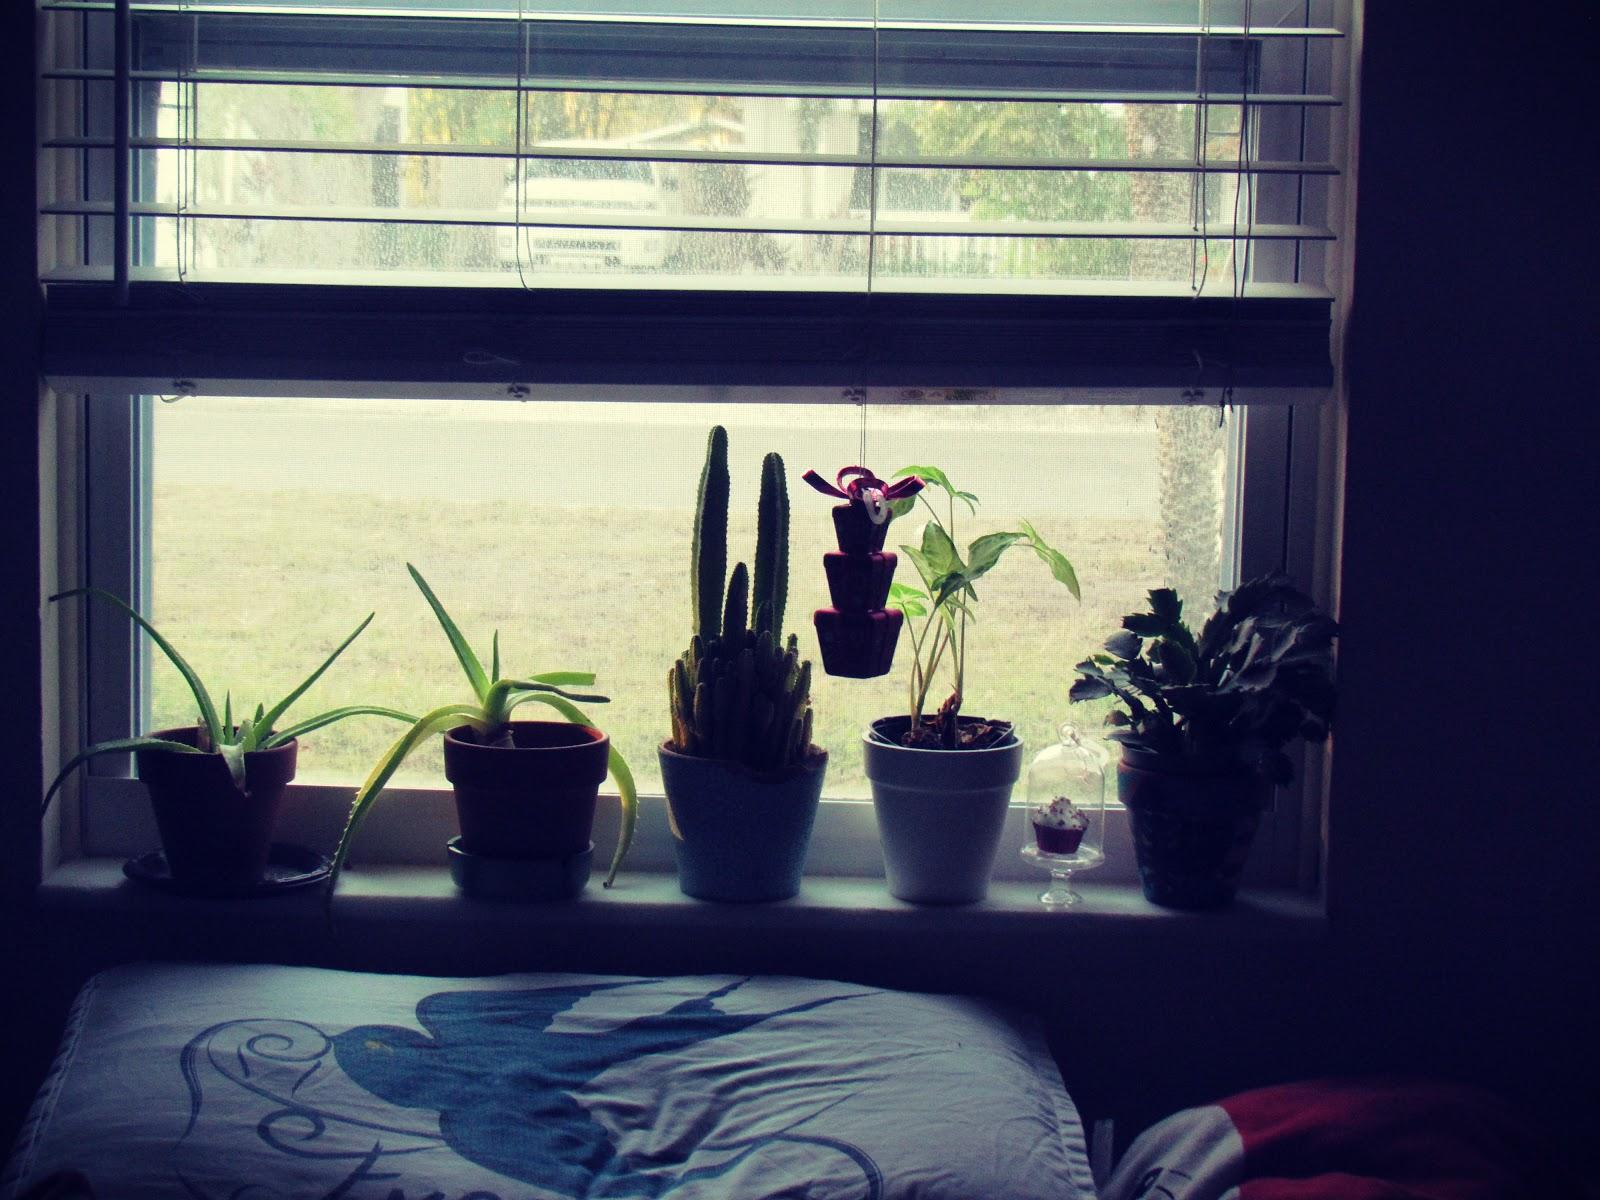 A Plant Windowsill Garden + Urban Garden Planning Development